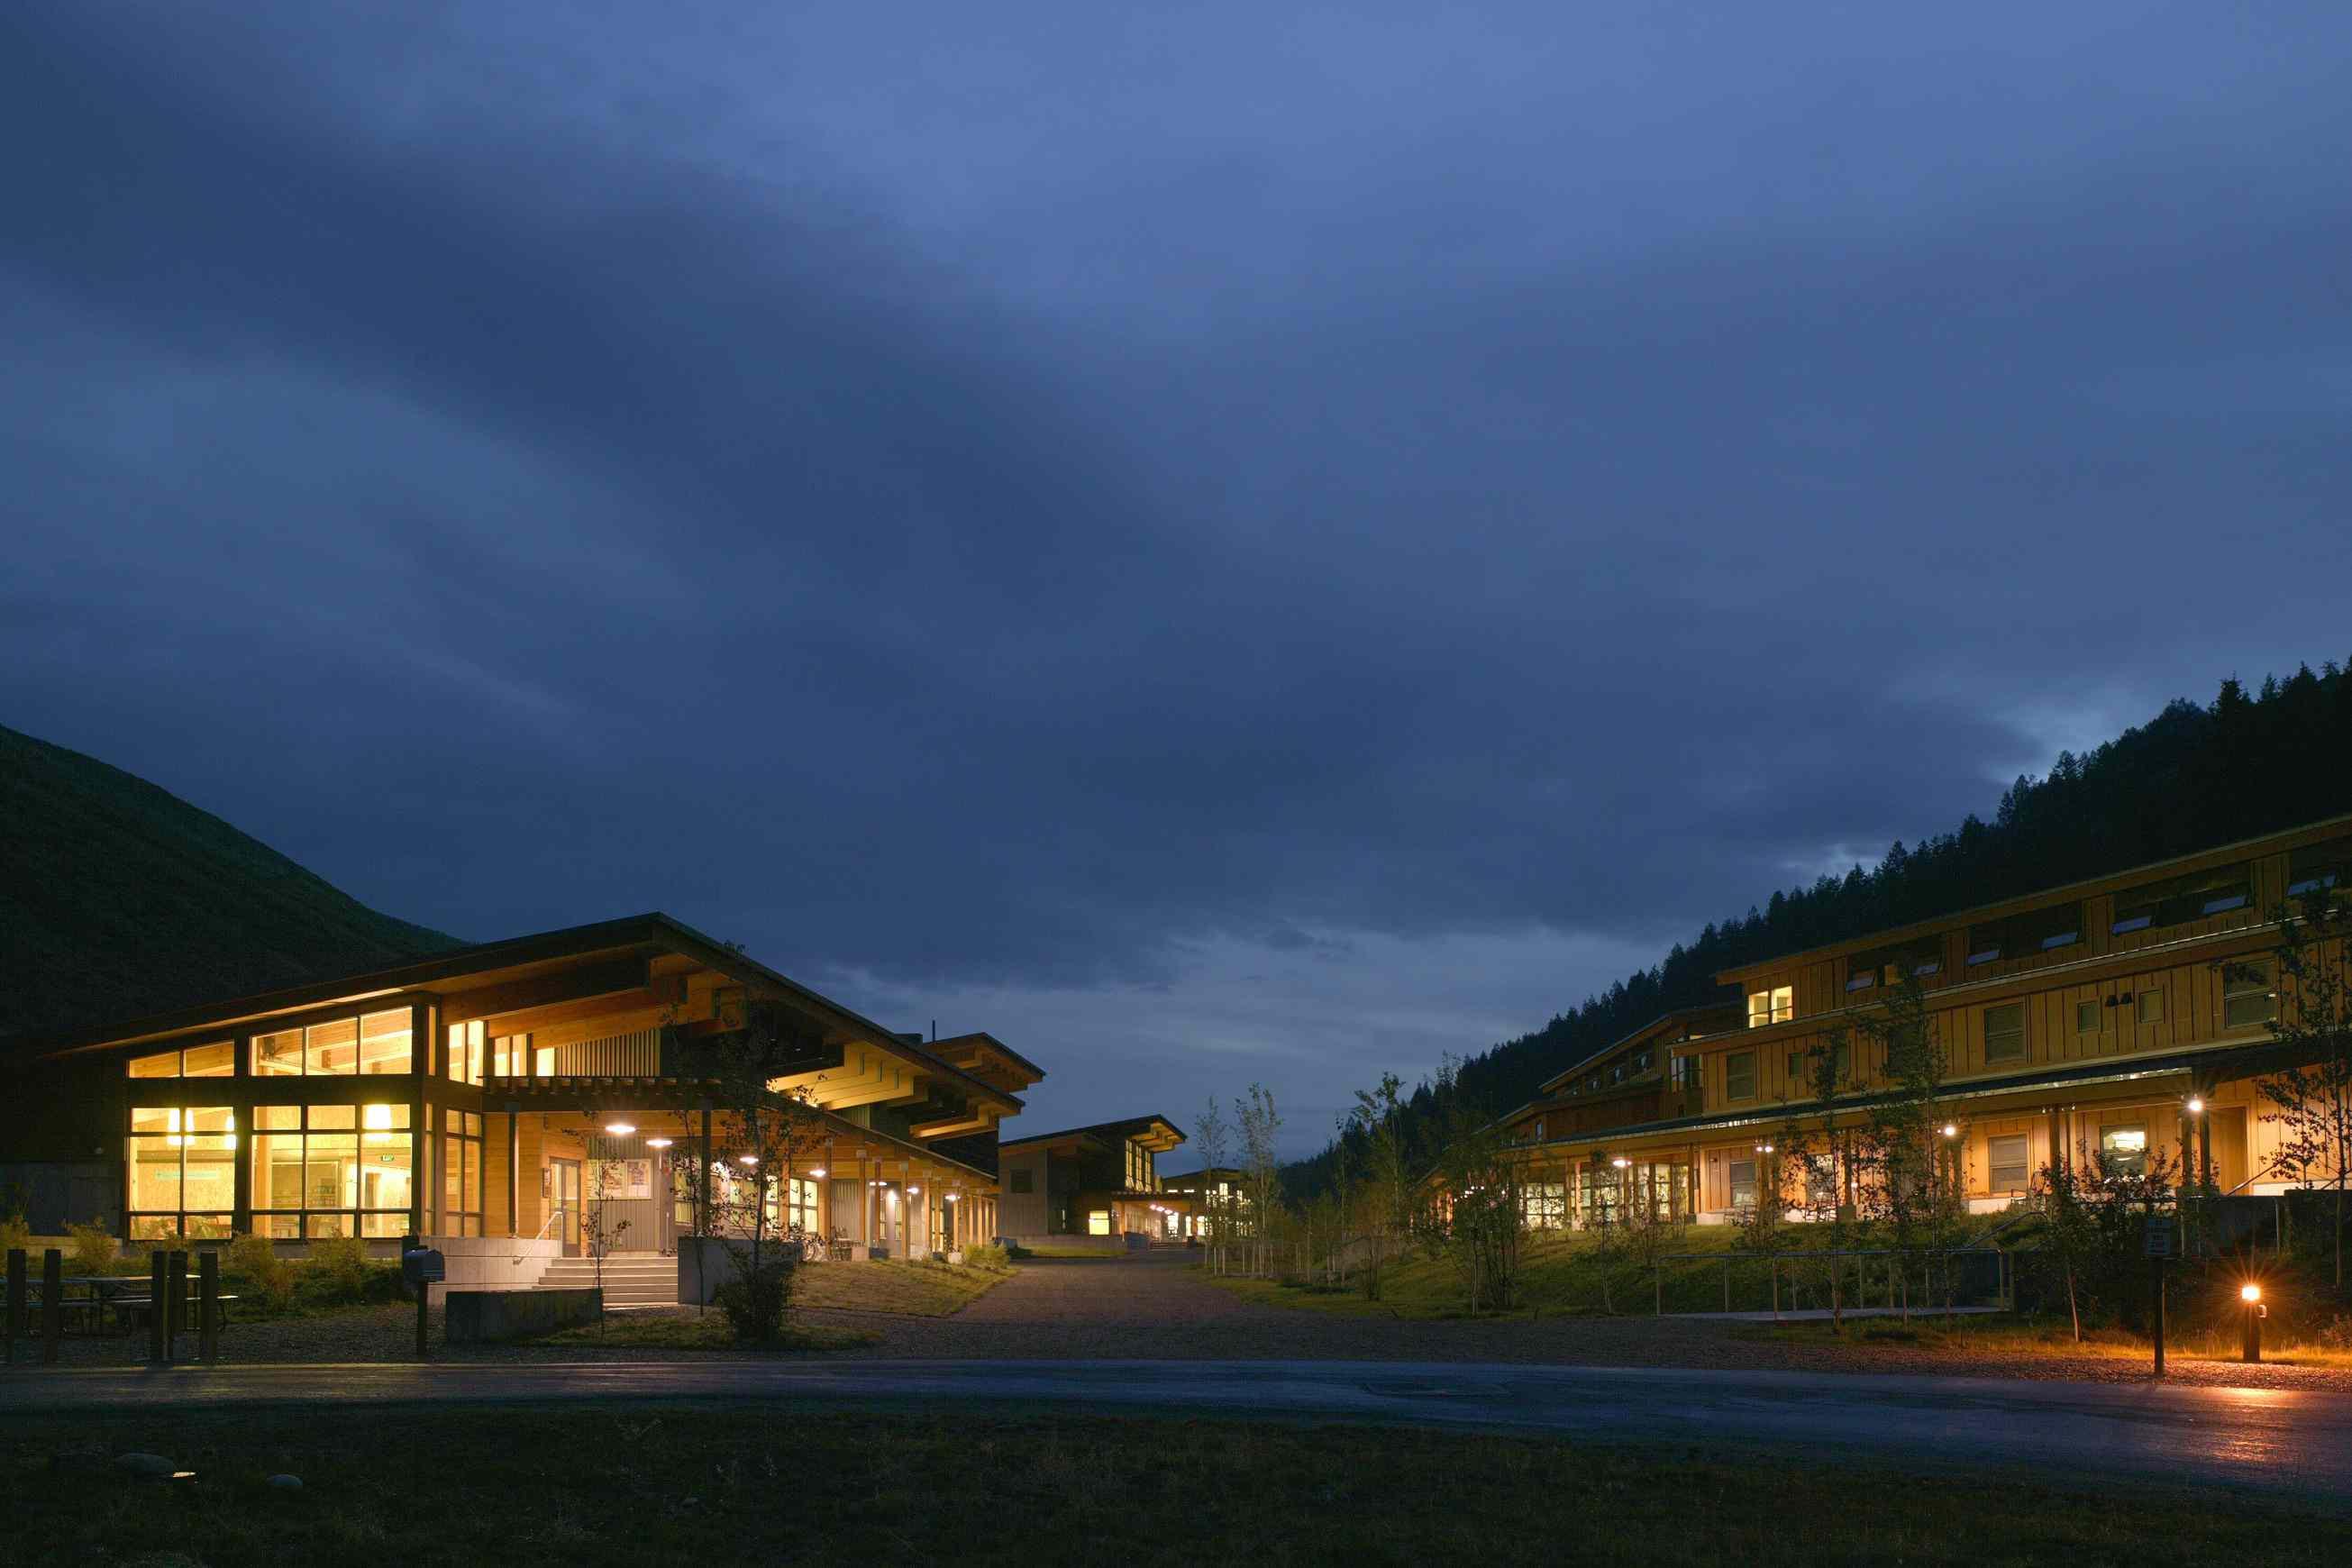 Teton Science School exterior lit up at night